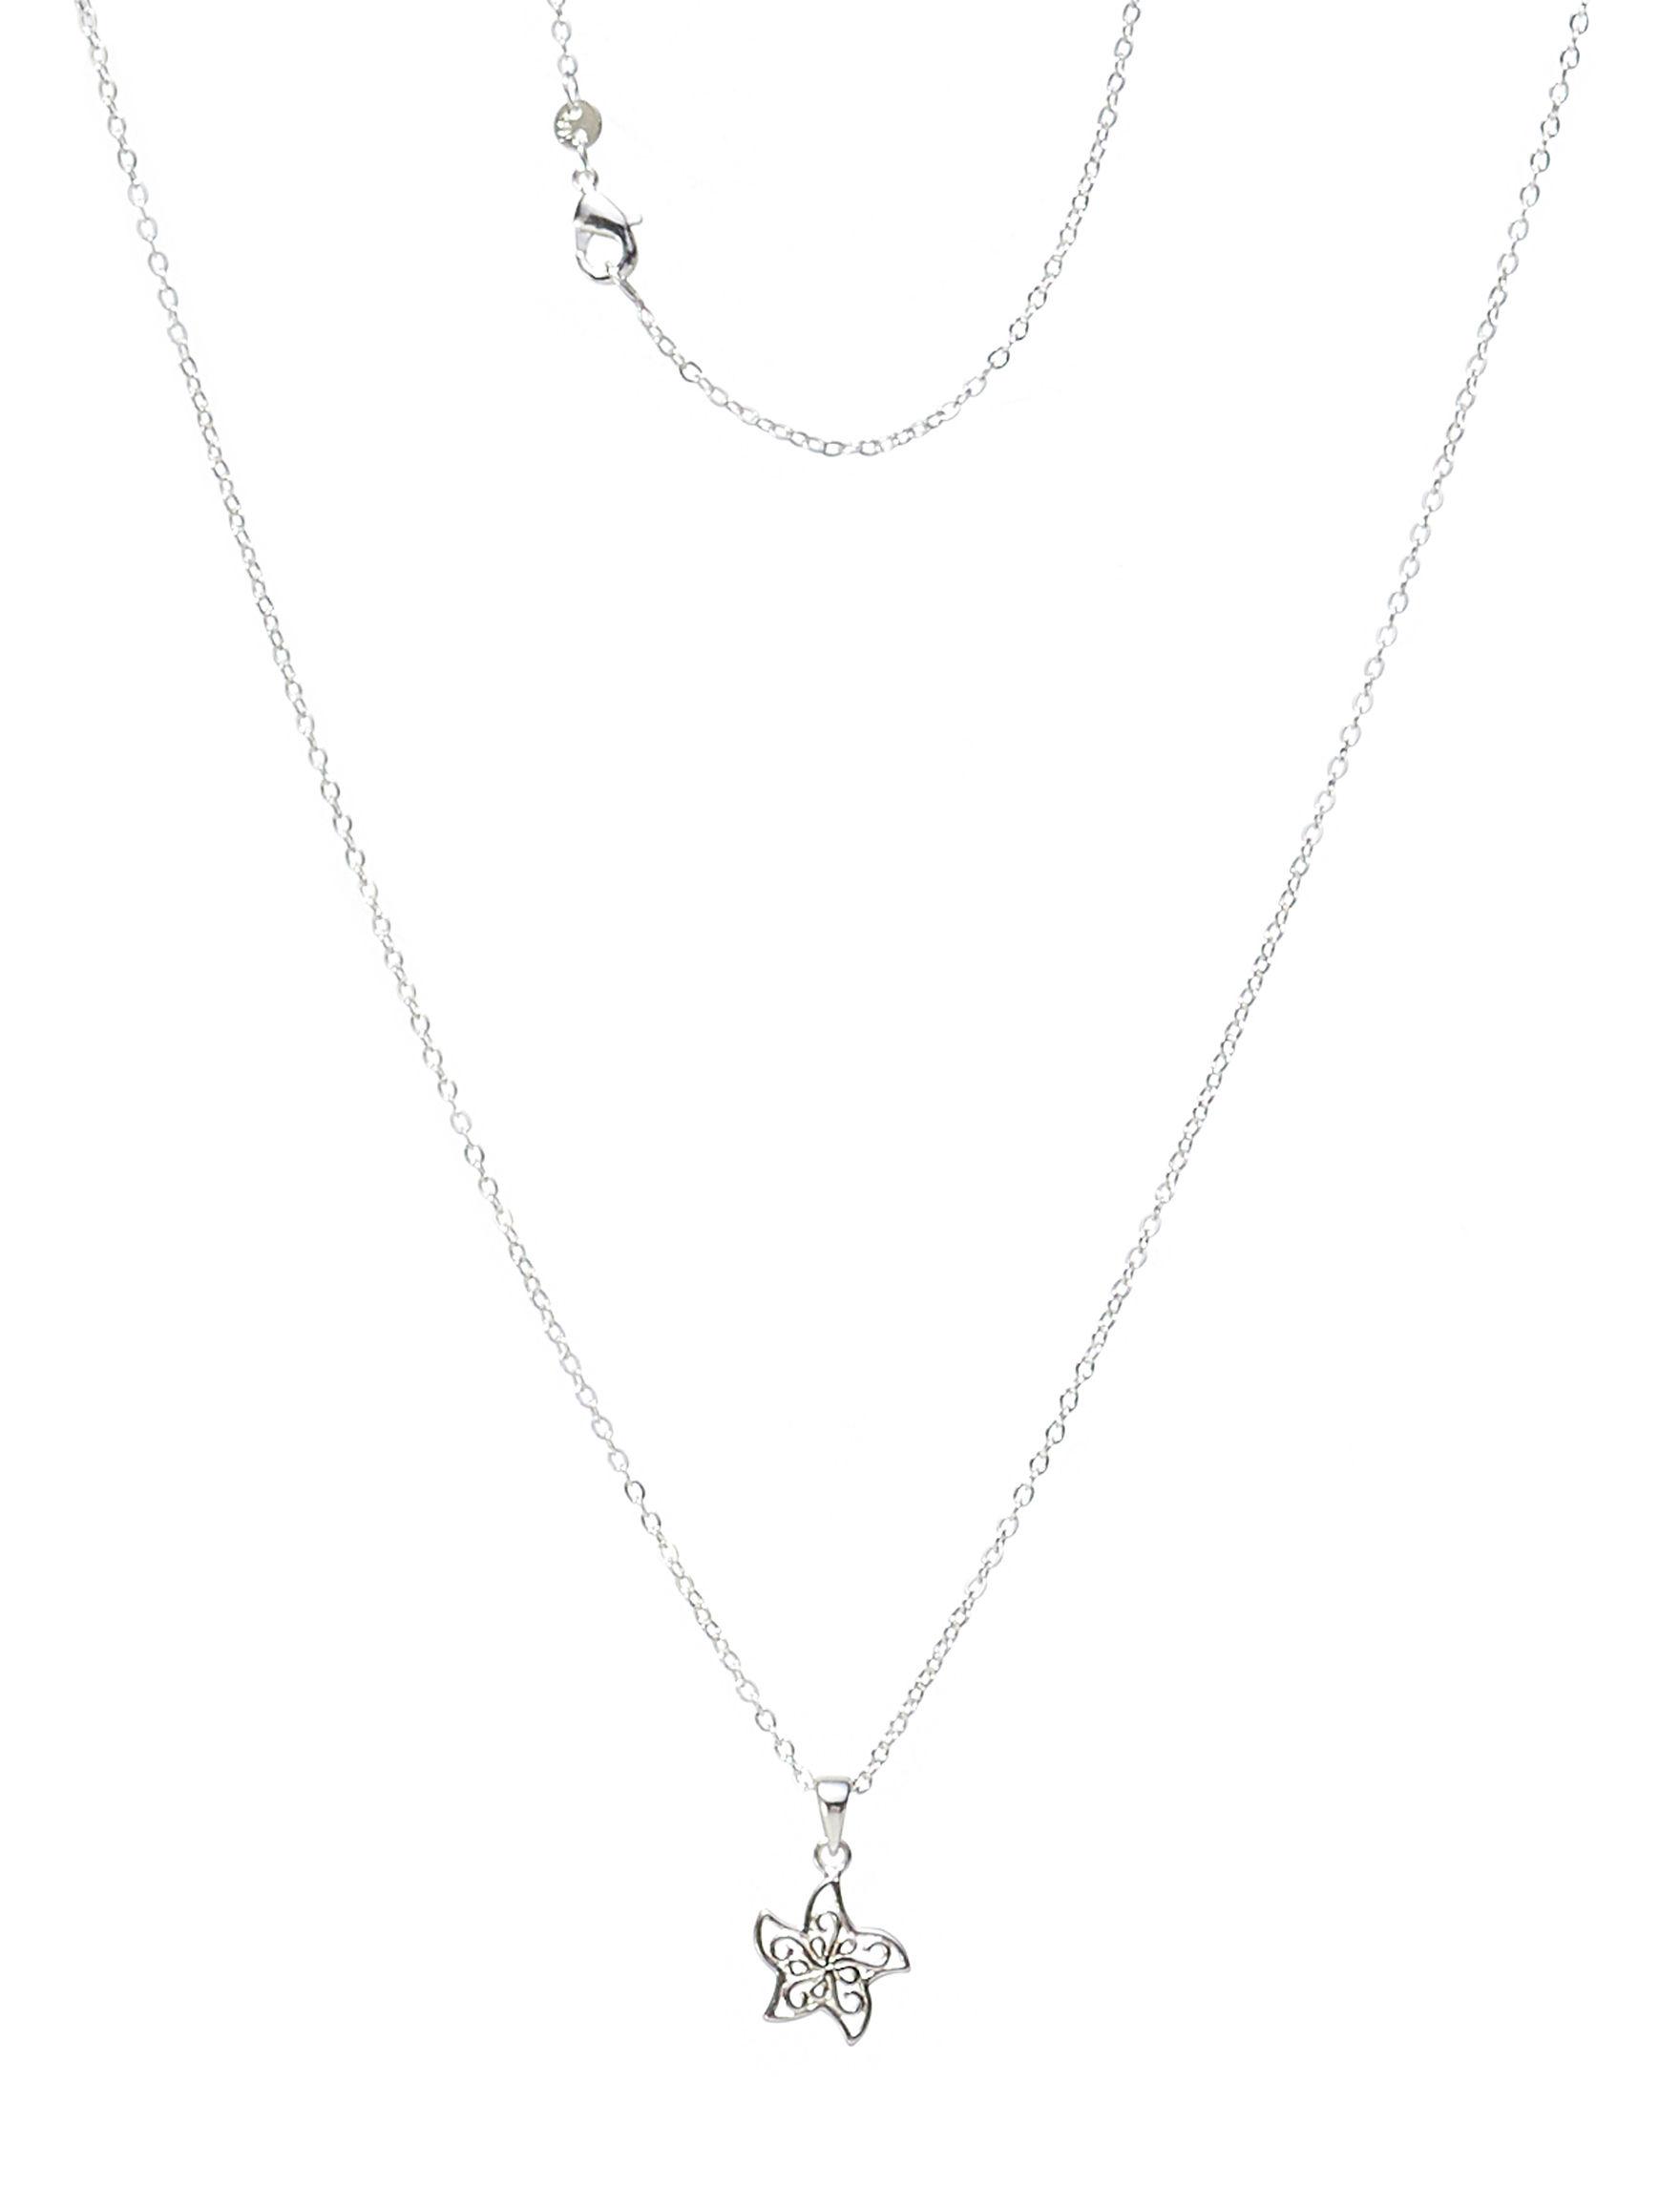 Marsala Silver Necklaces & Pendants Fine Jewelry